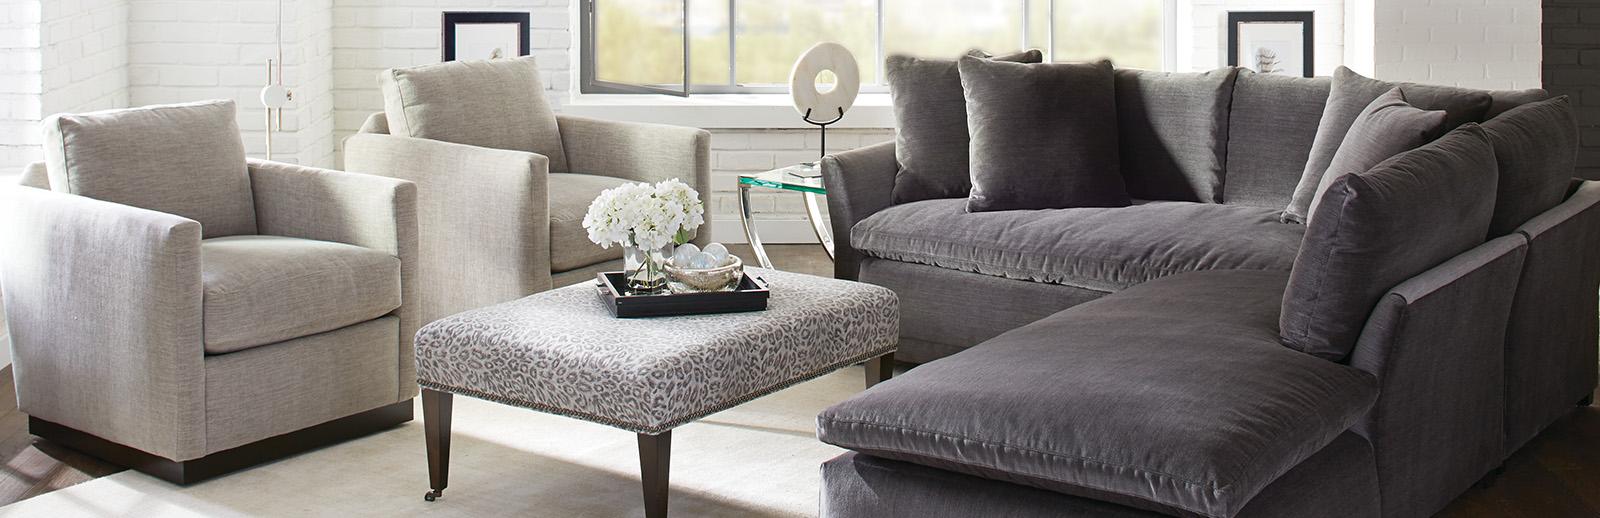 Genial Hucks And Washington | Furniture Store | Conway SC